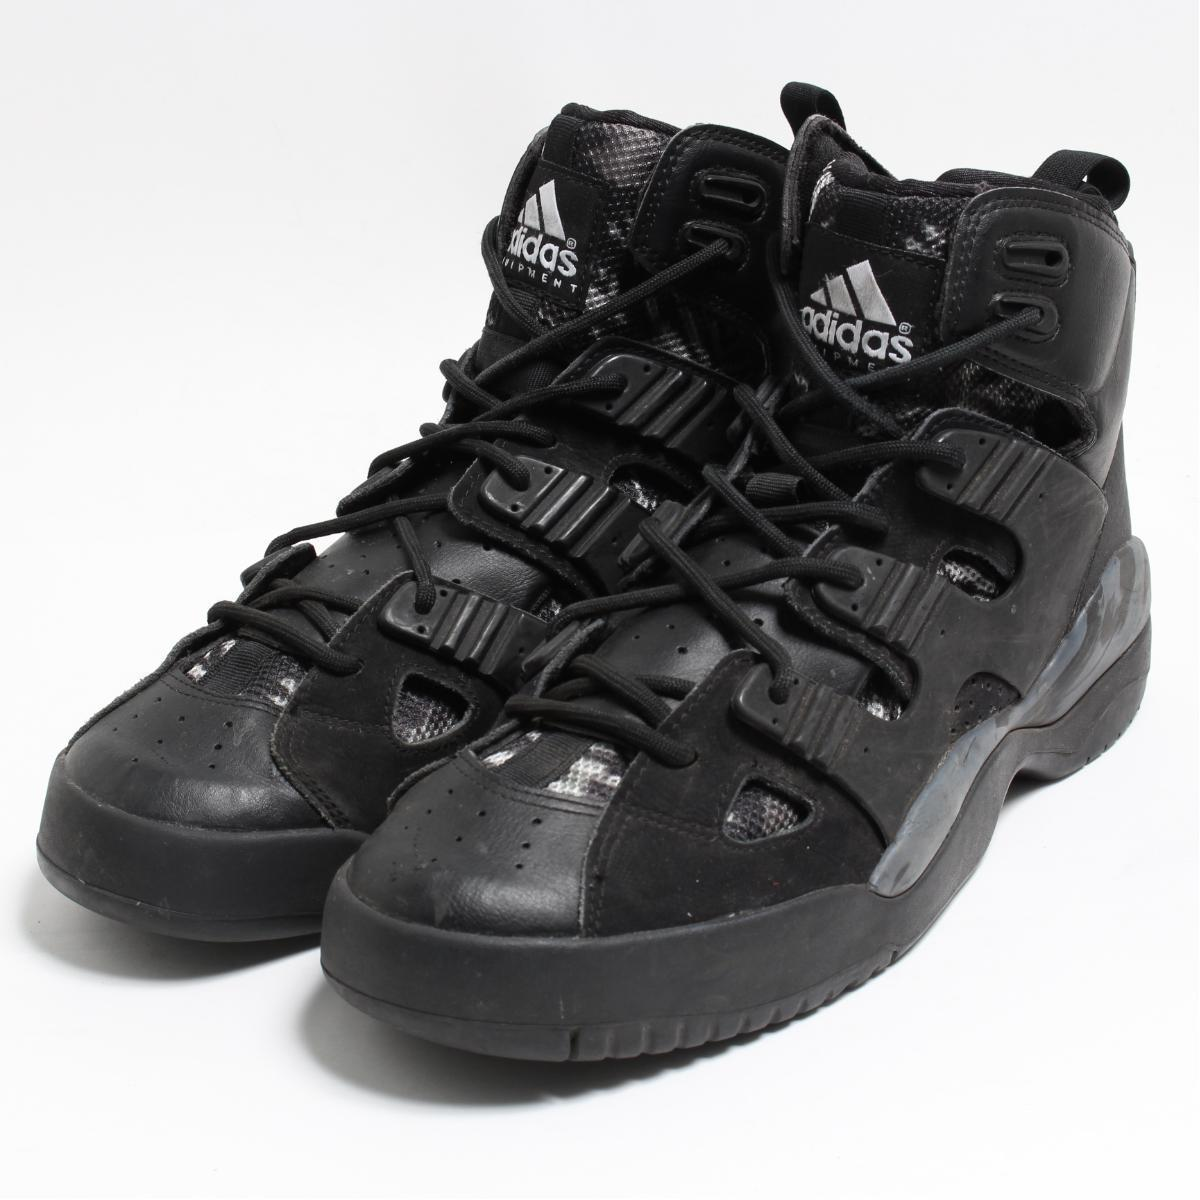 adidas eqt basket